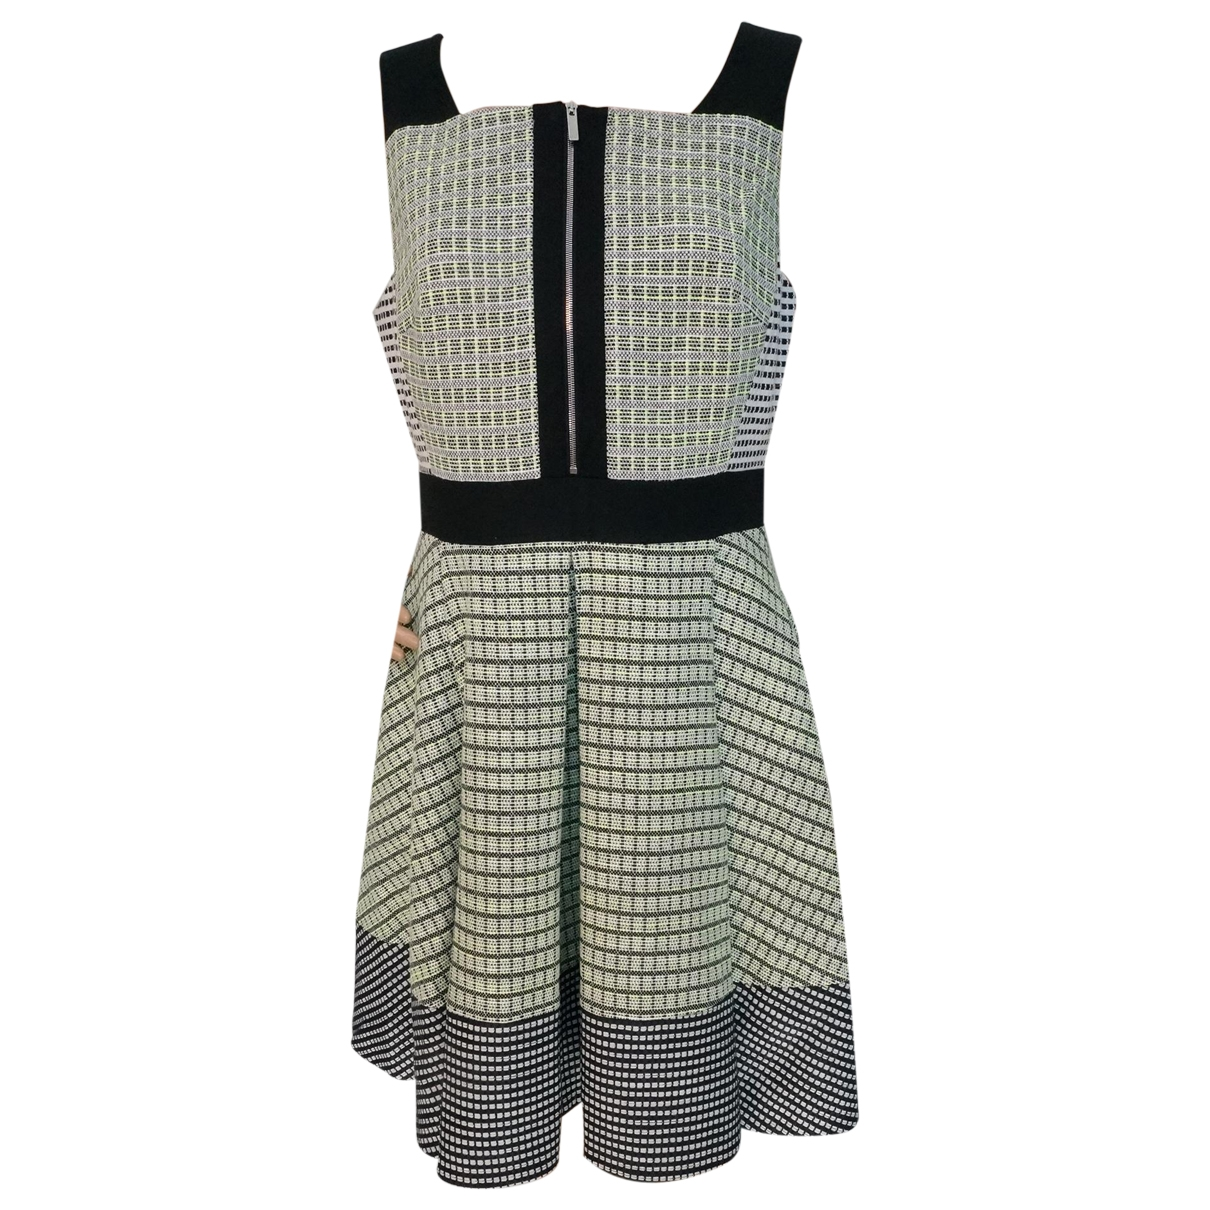 Karen Millen \N Kleid in  Gruen Baumwolle - Elasthan